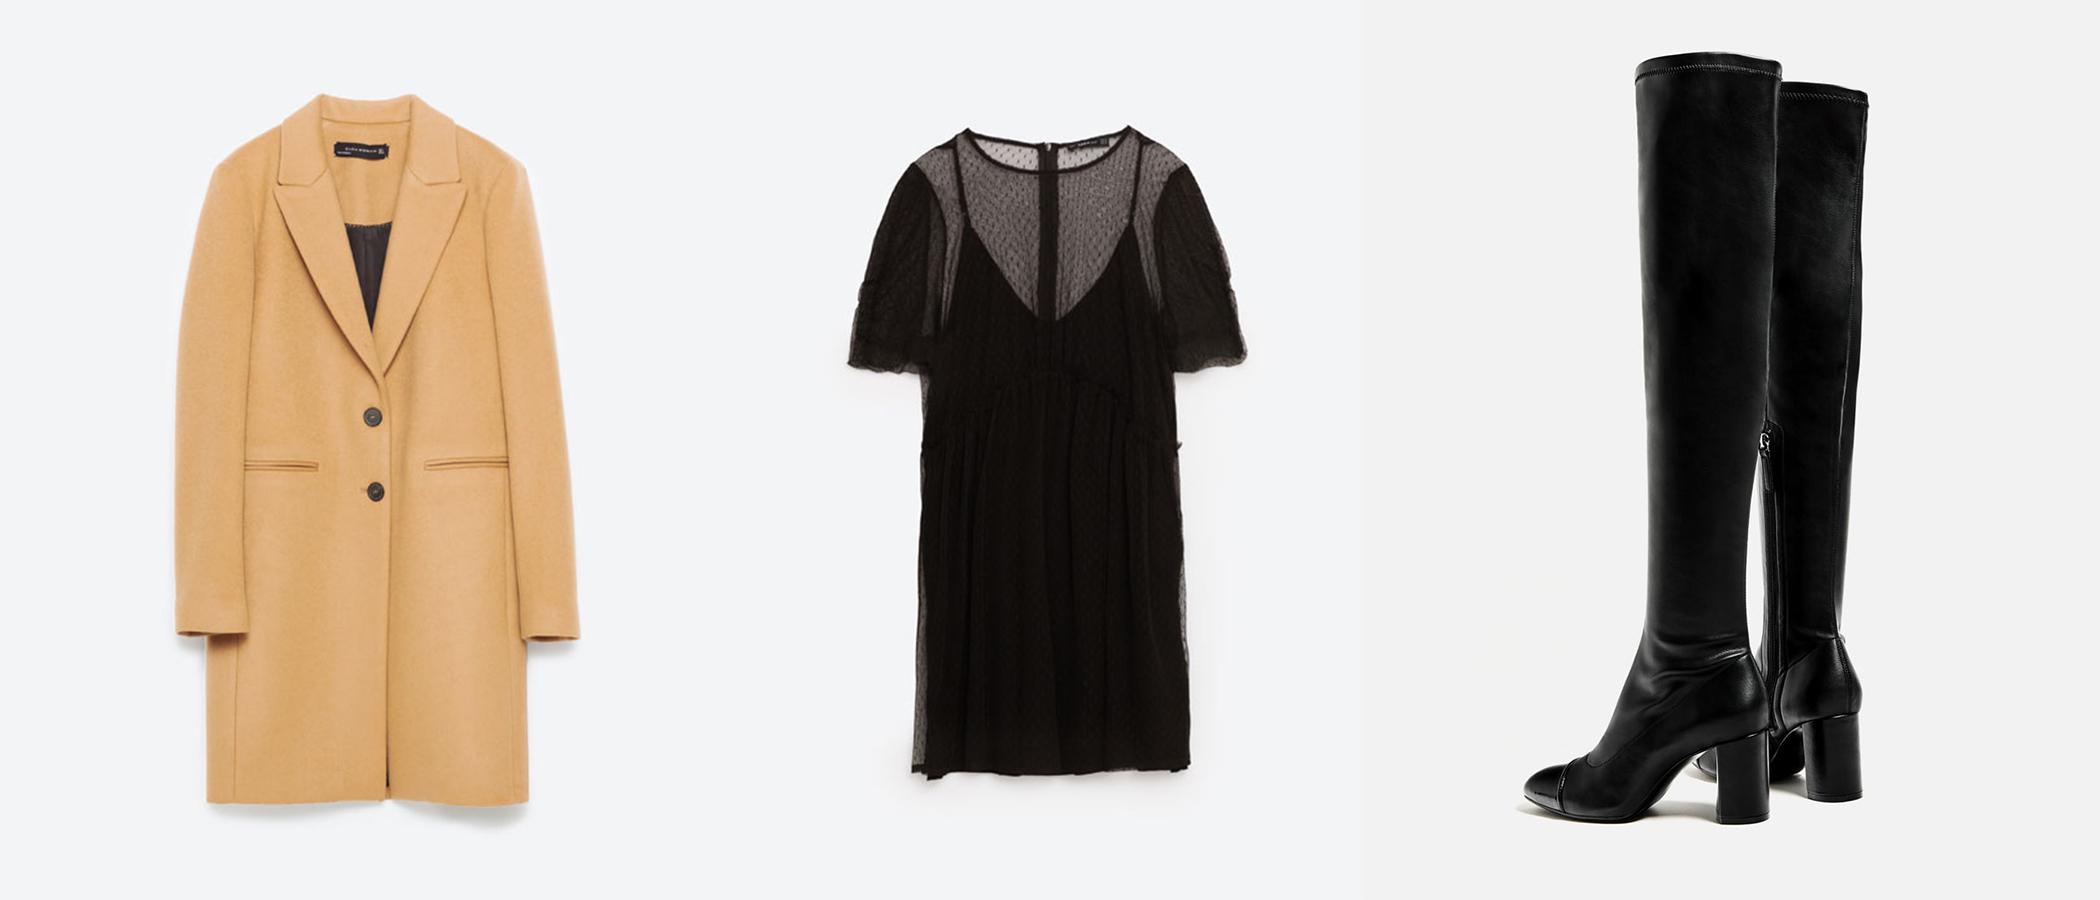 Masculine Coat in Camel     ($190) //   Tulle + Knit Dress   ($50) //   OTK High Heel Cap Toe Boots   ($90)